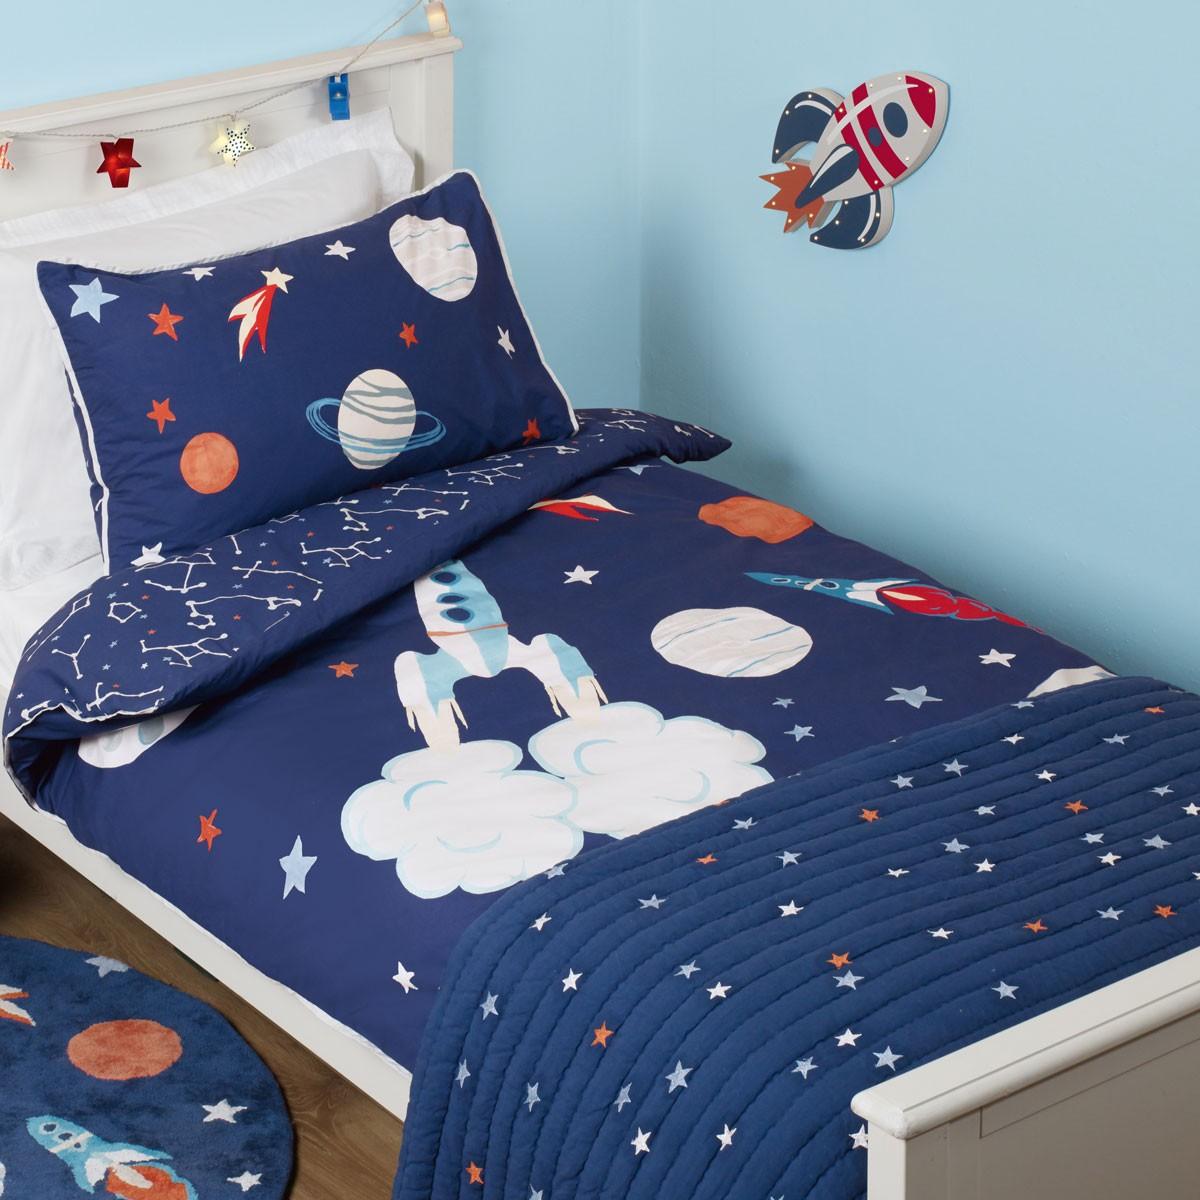 Comprar funda nórdica Outer Space de diseño   Laura Ashley Decoracion